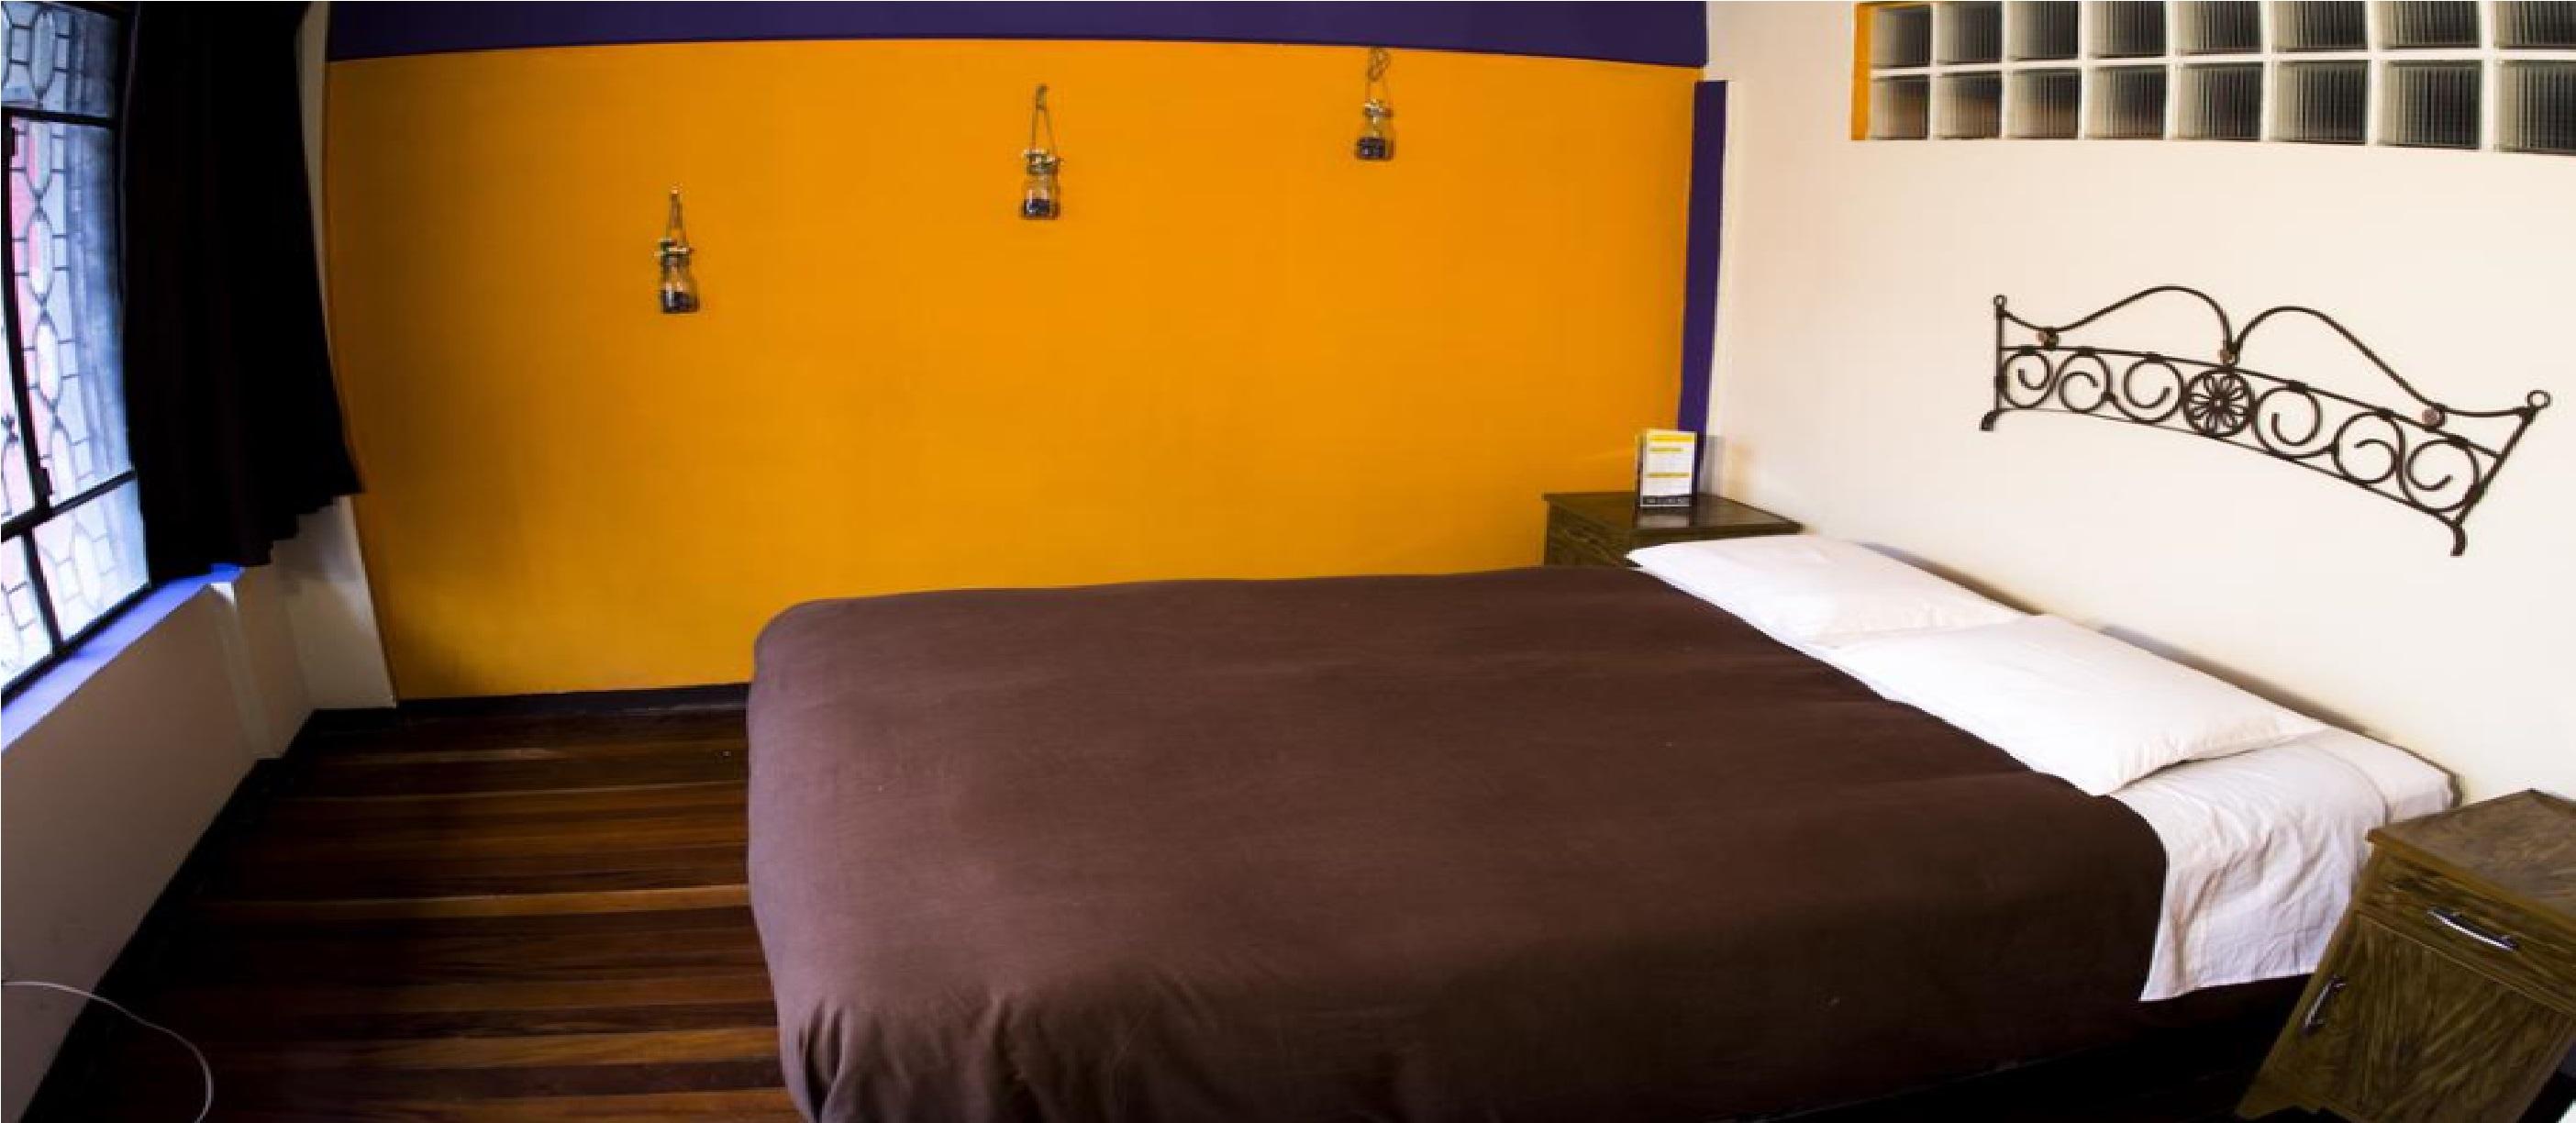 york bed and breakfast, Pedro Domingo Murillo